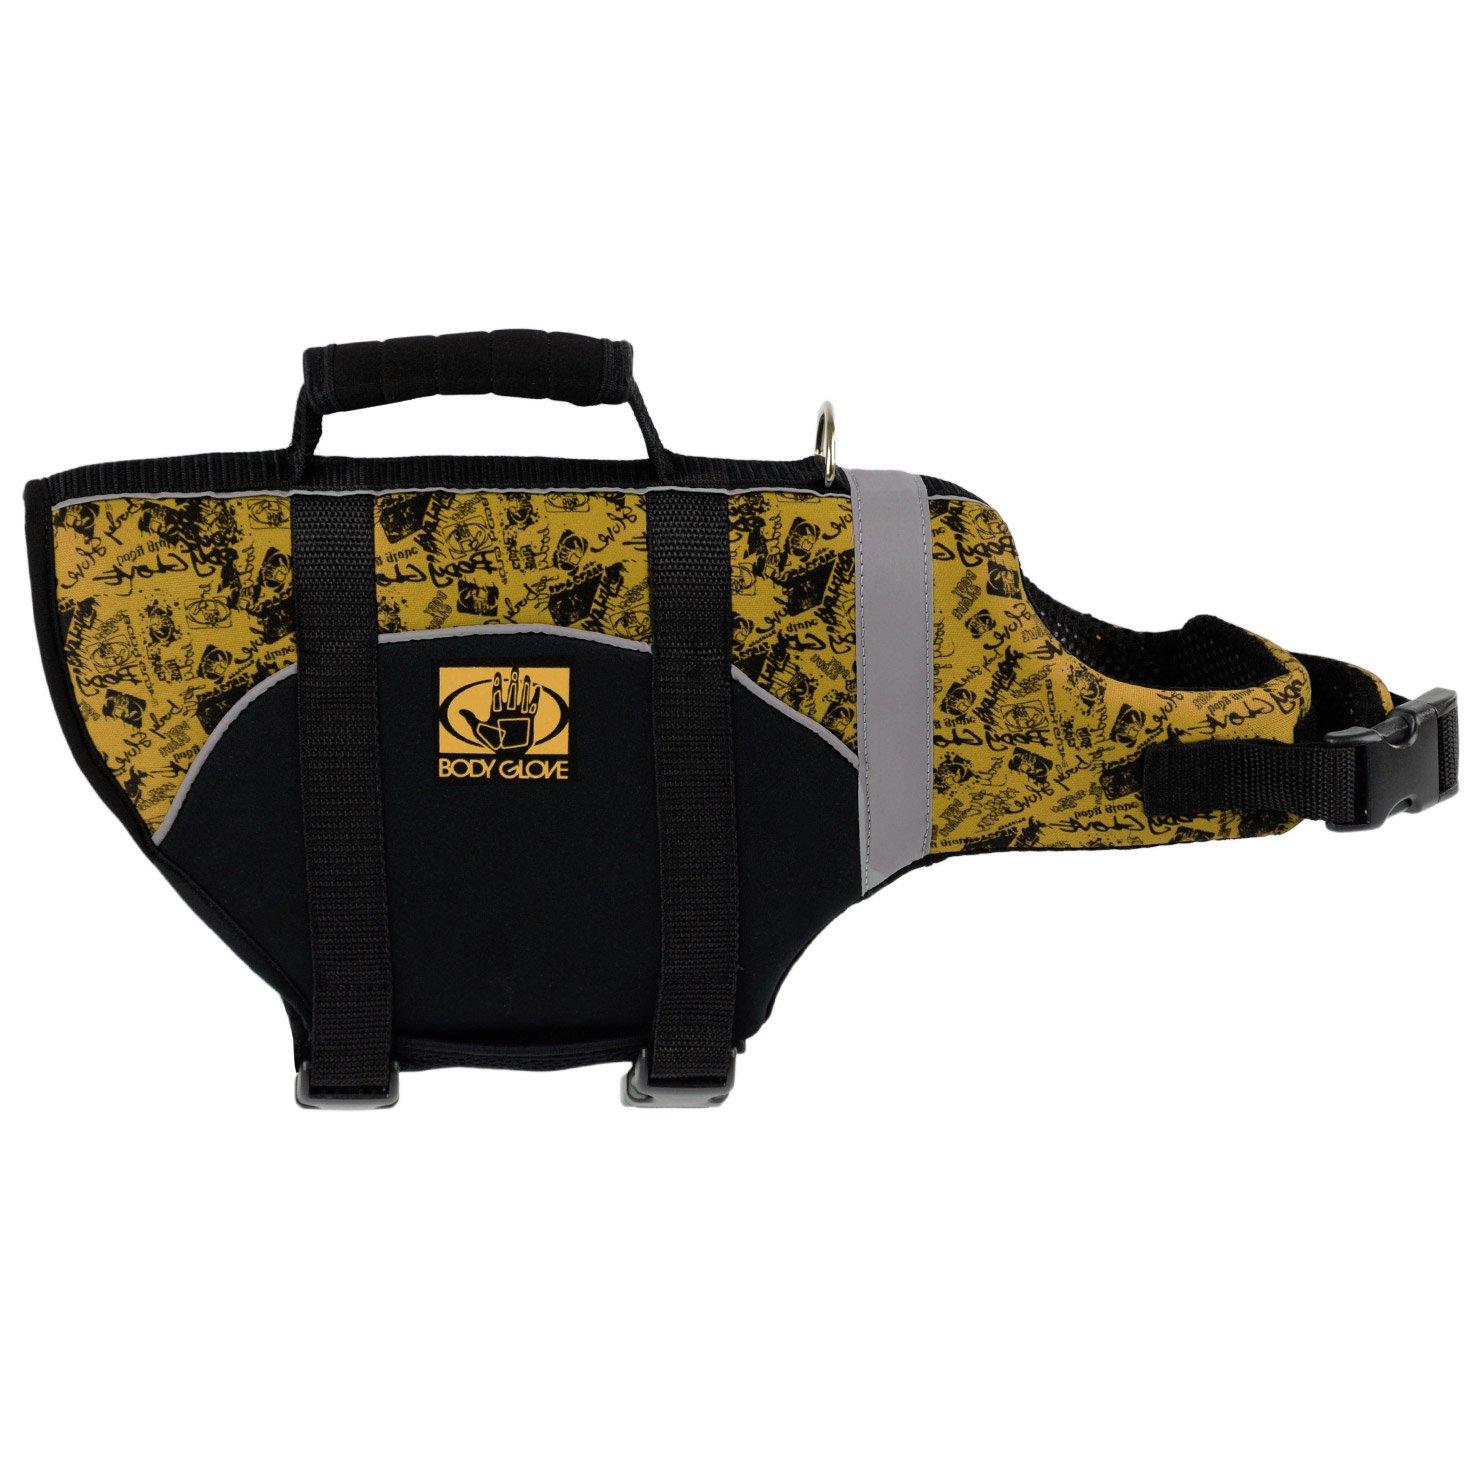 Body Glove Pet Flotation Device, Large, Black/Yellow